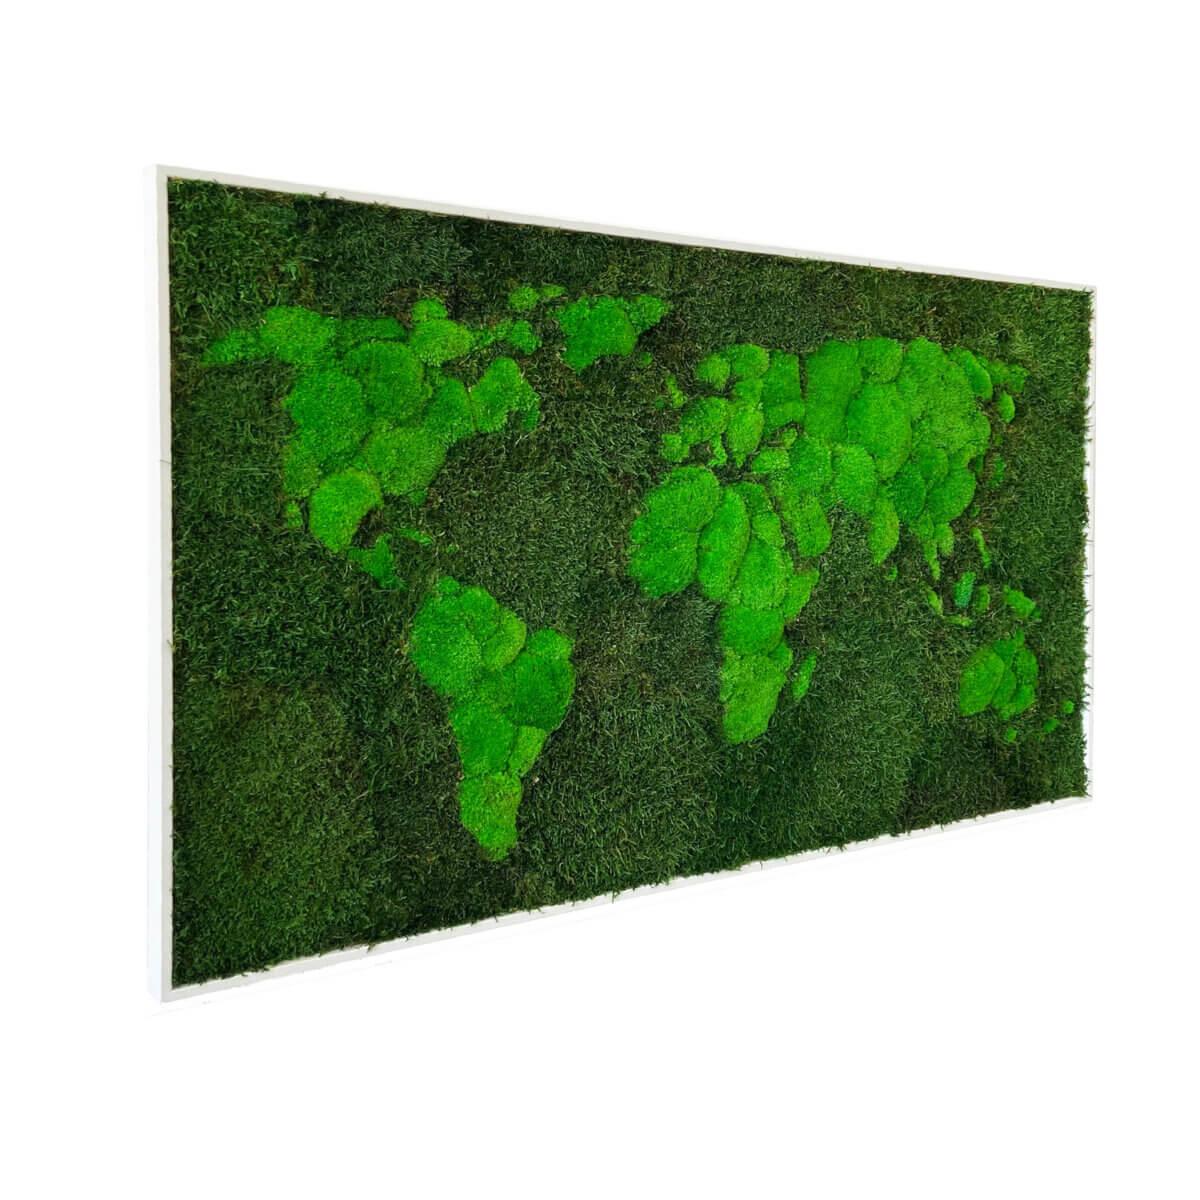 Moss World Map - organic lichen